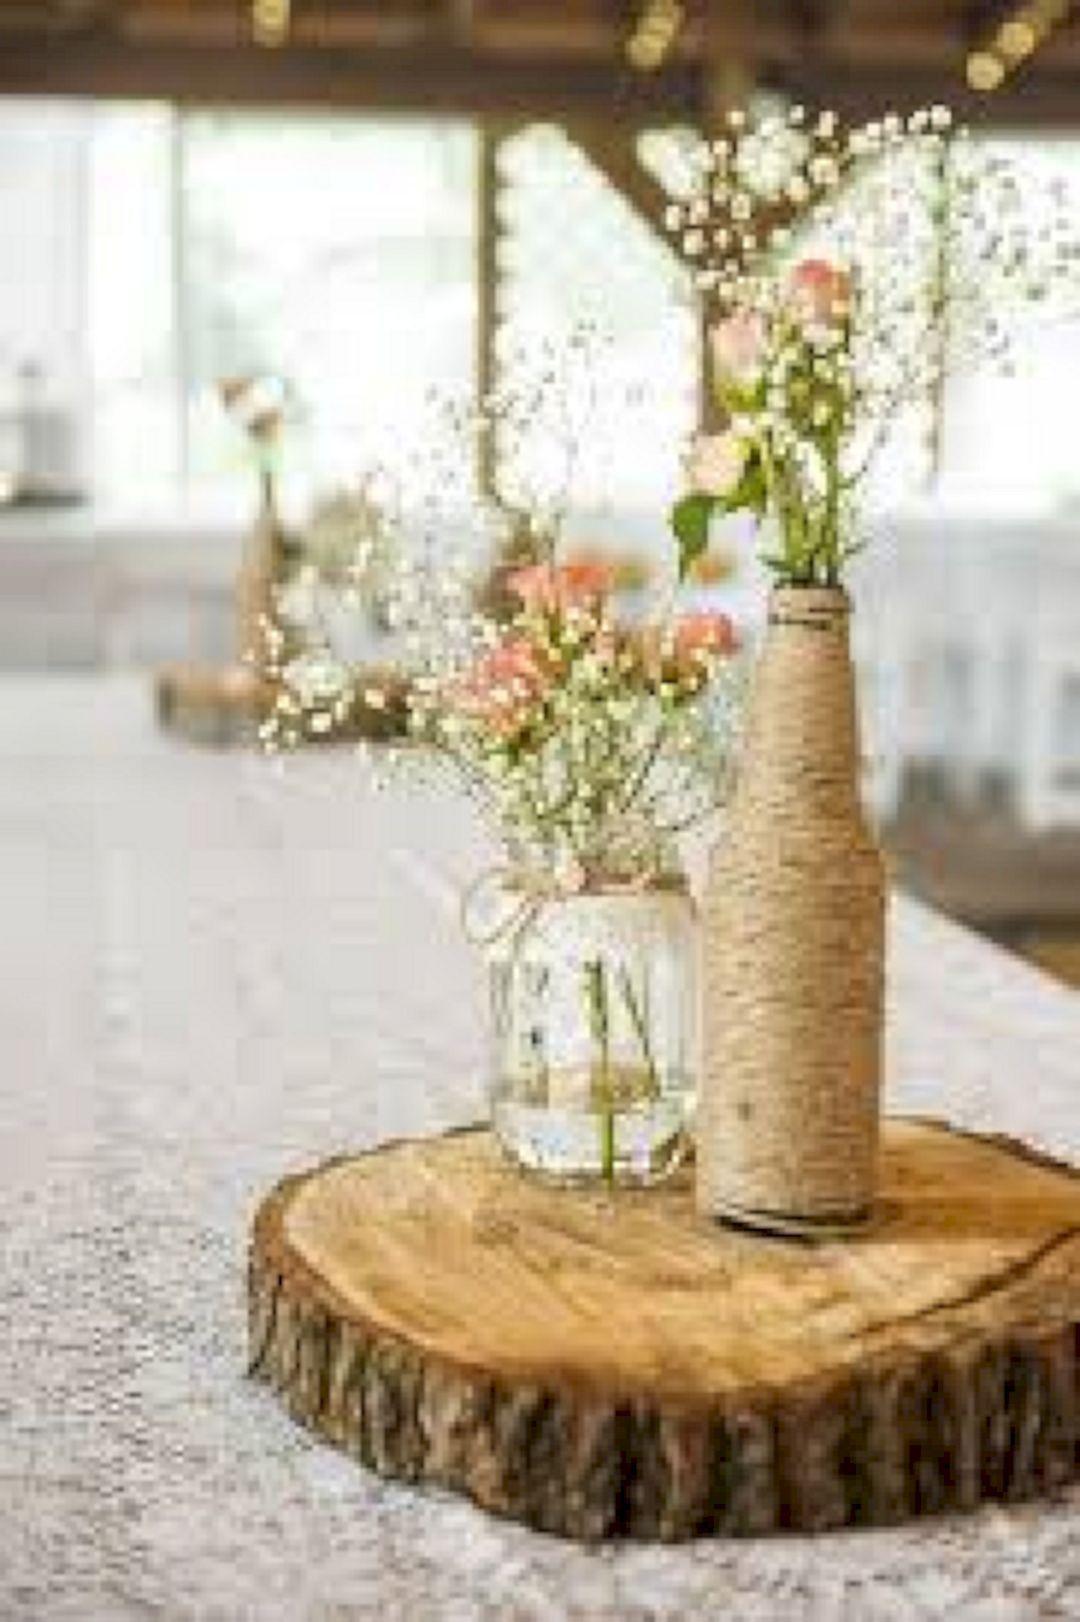 Farm wedding decor ideas   DIY Creative Rustic Chic Wedding Centerpieces Ideas  Wedding